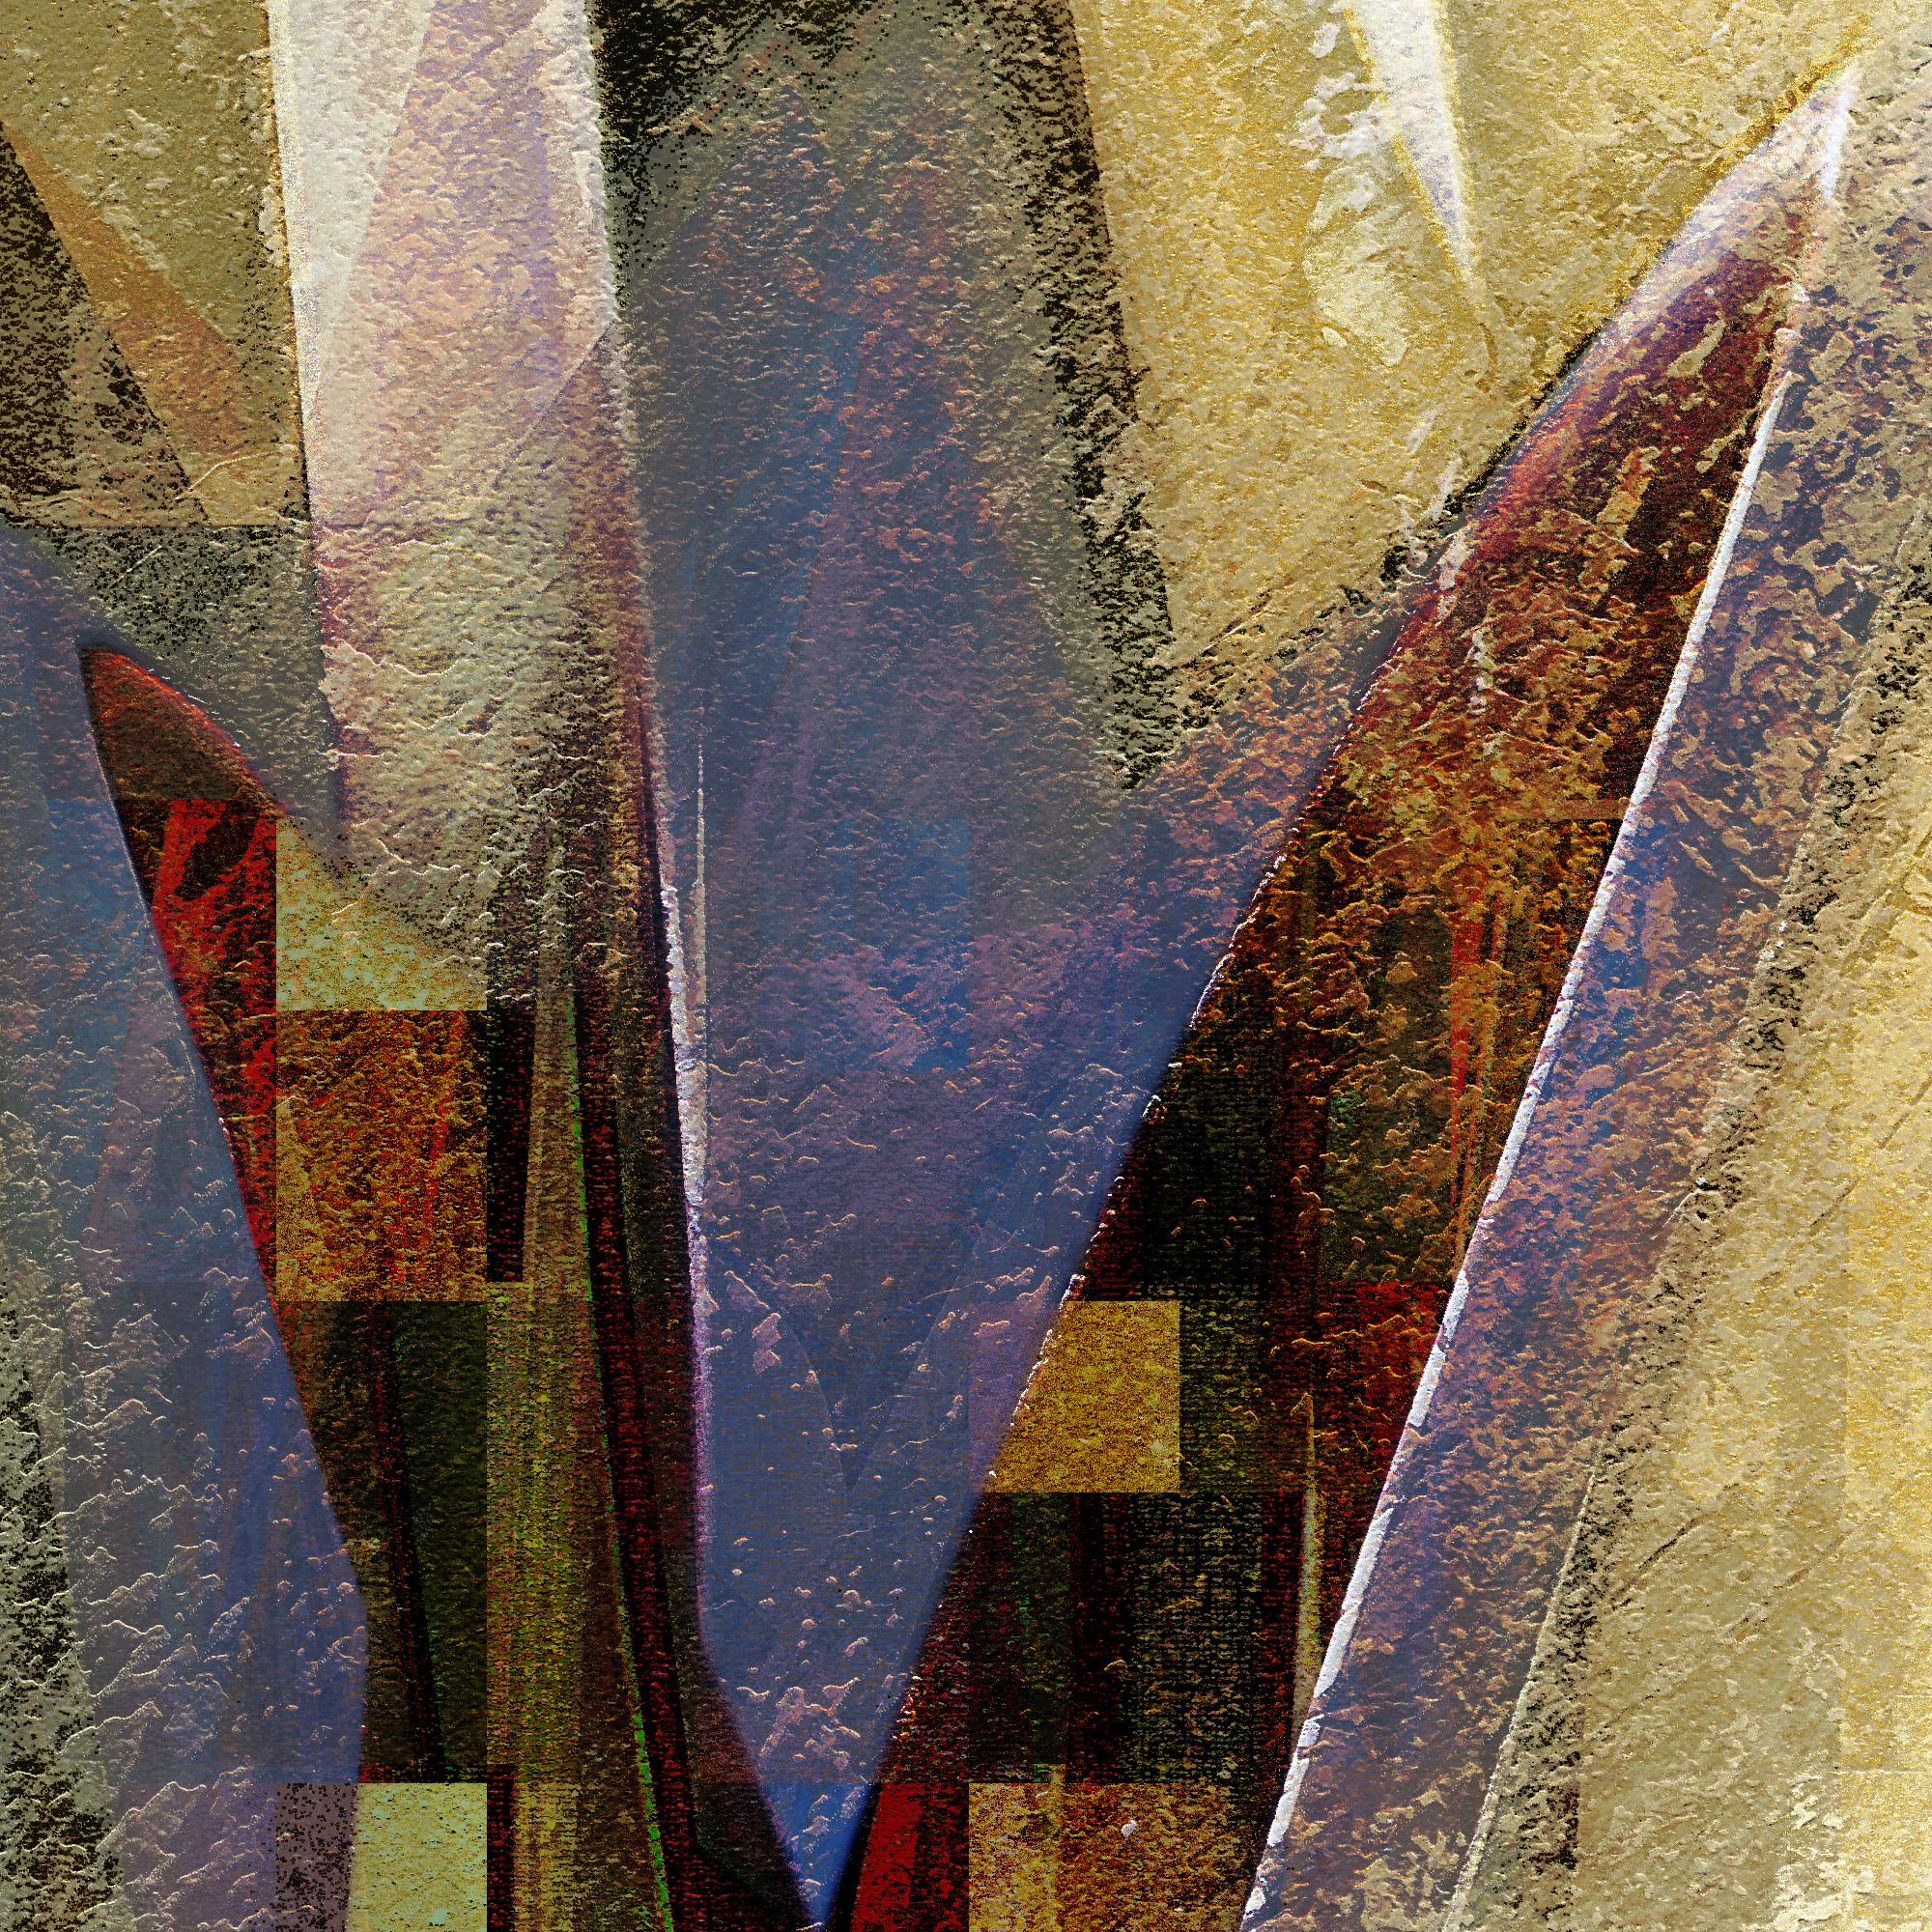 180623_Waking_in_a_Dream_Detail1.jpg